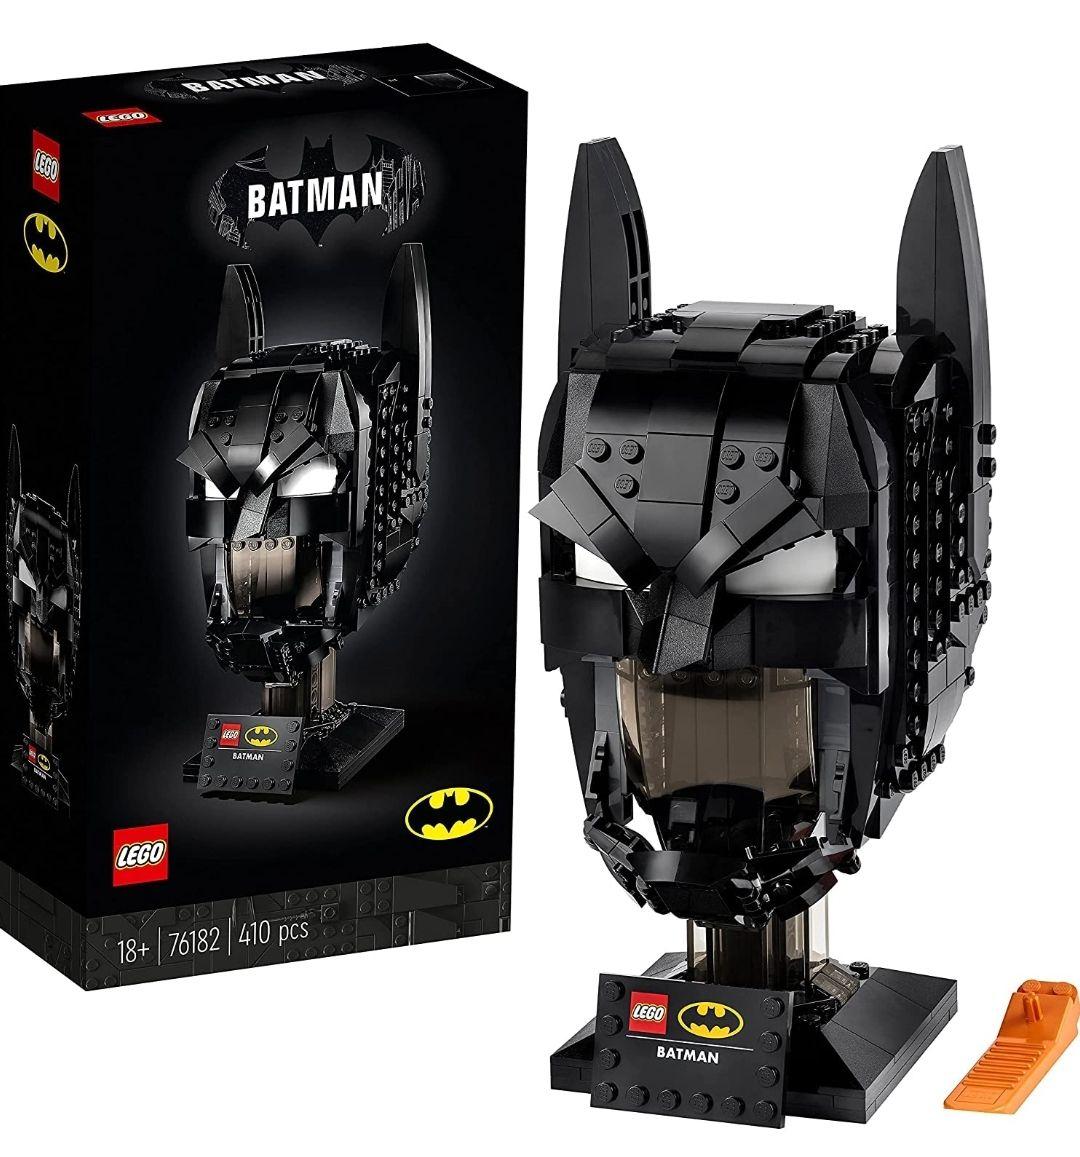 LEGO Batman 76182 Cowl Mask £33.00 at Amazon